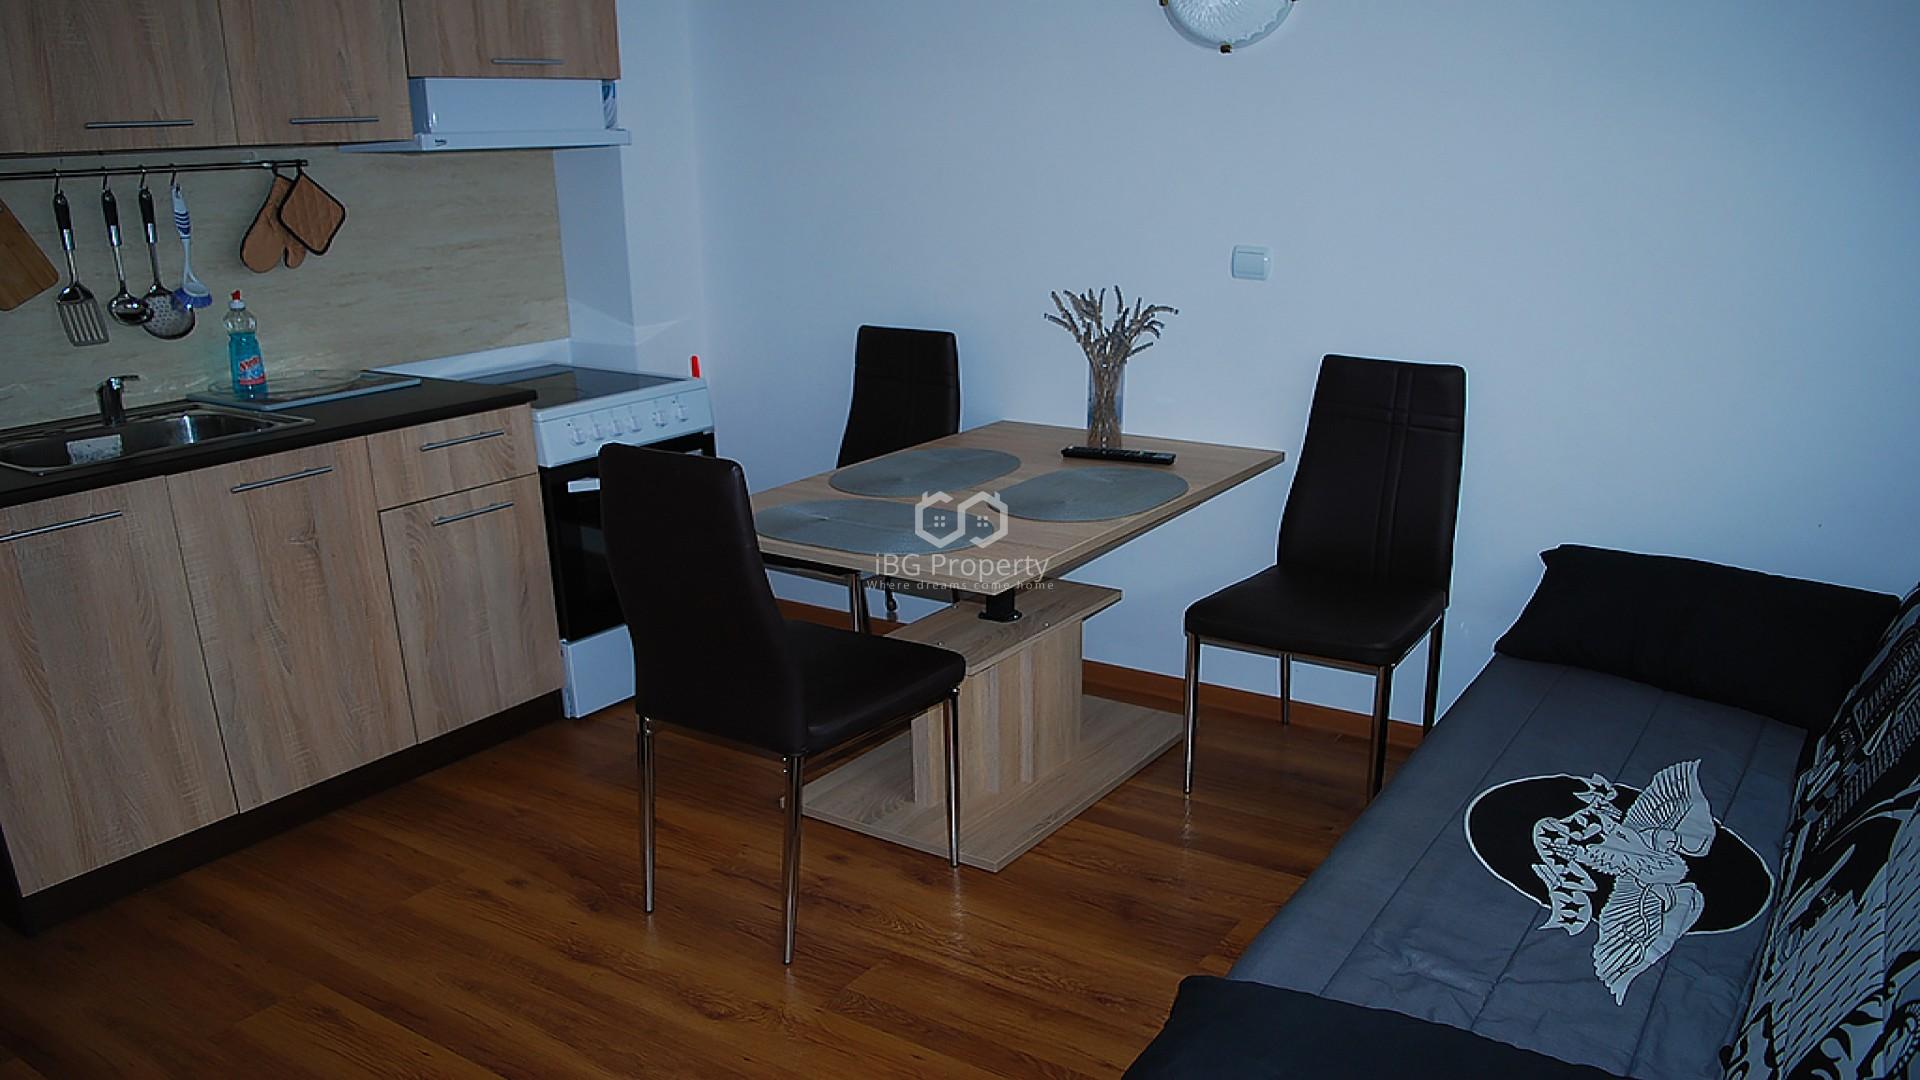 Eдностаен апартамент Слънчев Бряг 35 m2